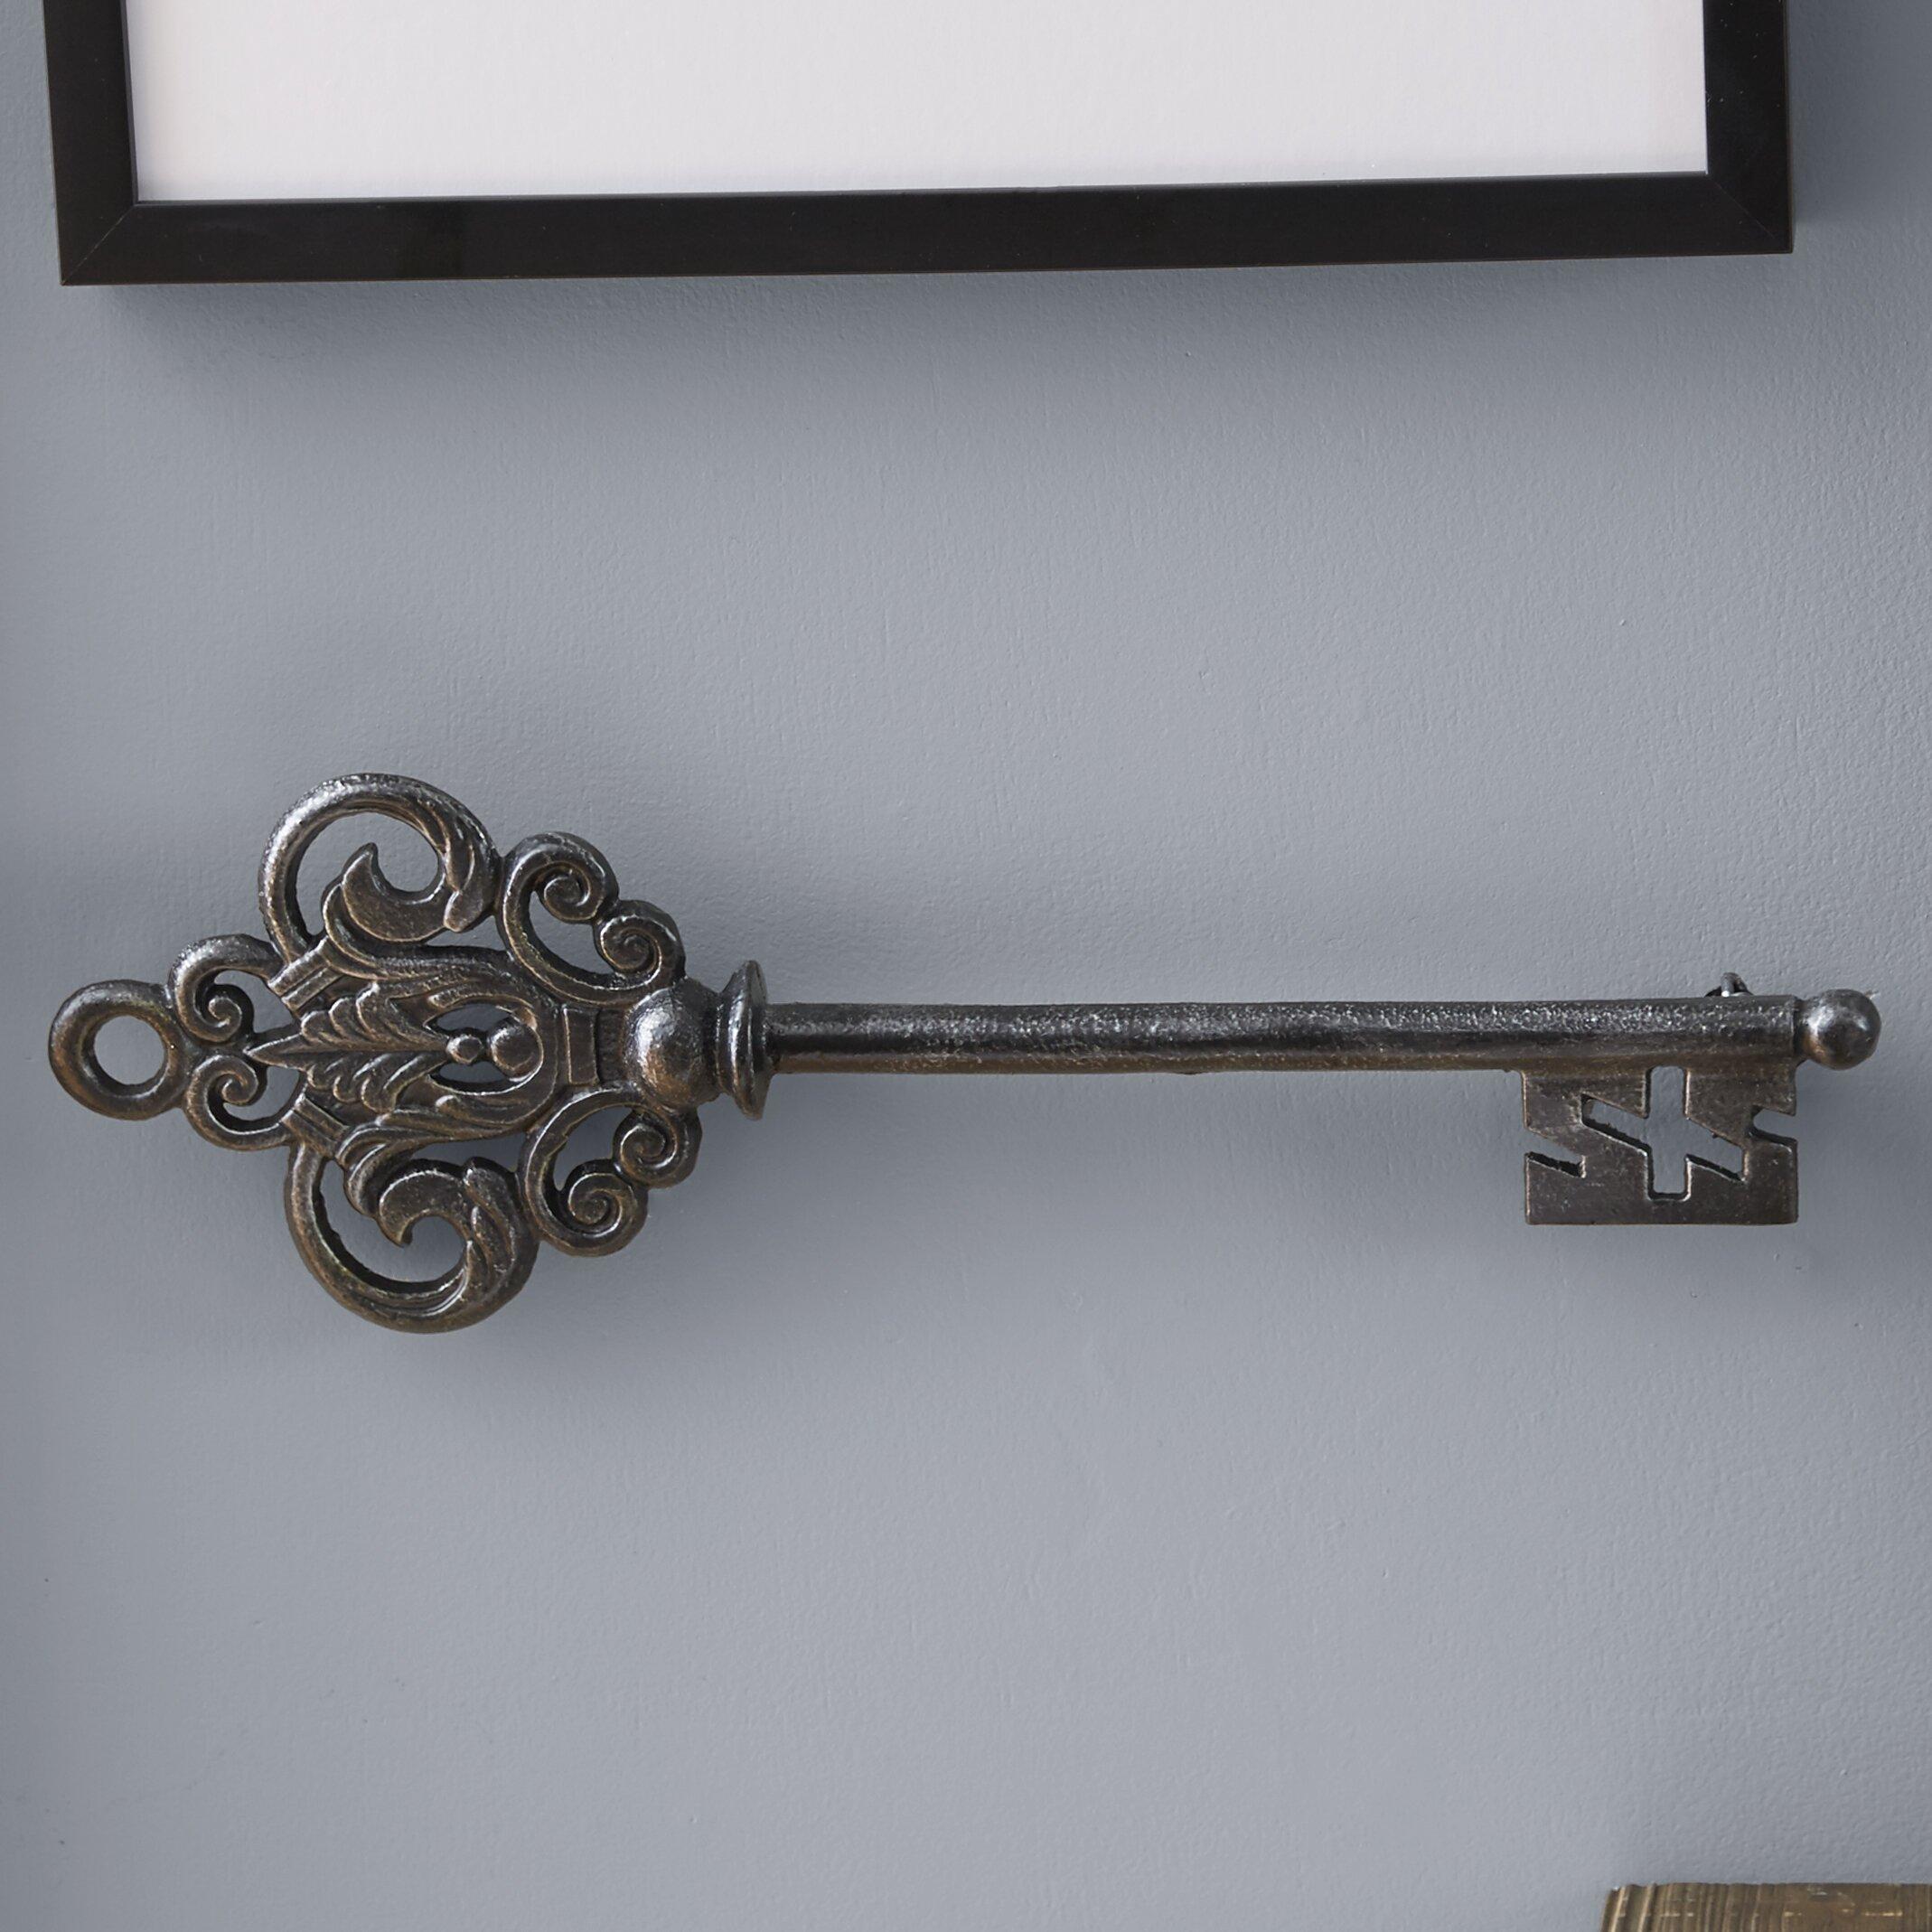 Lark Manoru0026trade; Skeleton Key Wall Decor